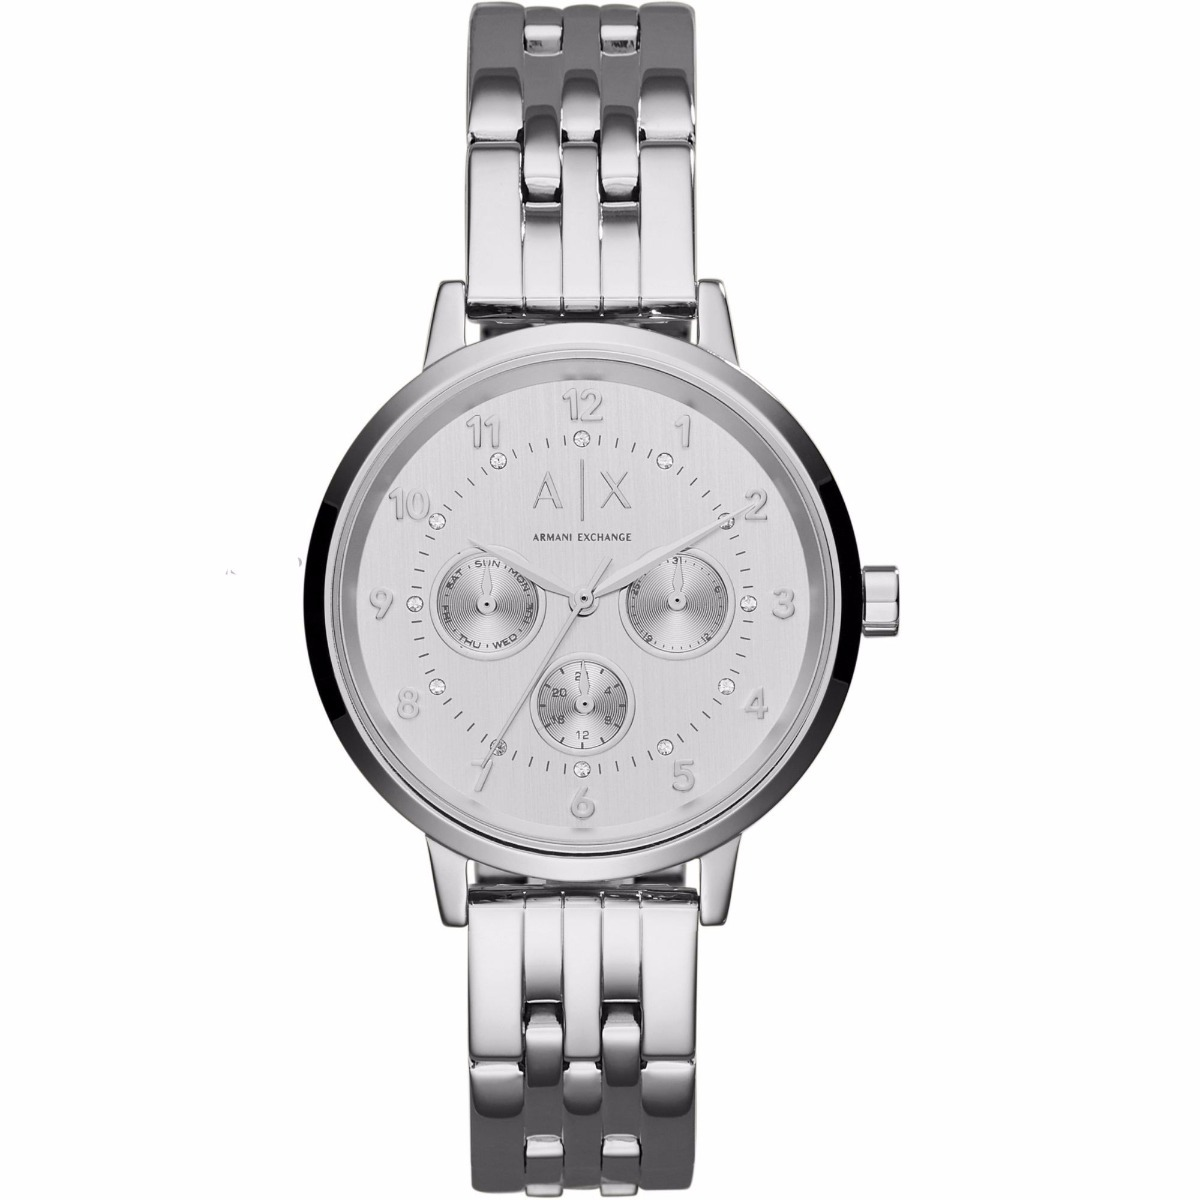 52dda733f1ff reloj armani mujer tienda oficial ax5376. Cargando zoom.